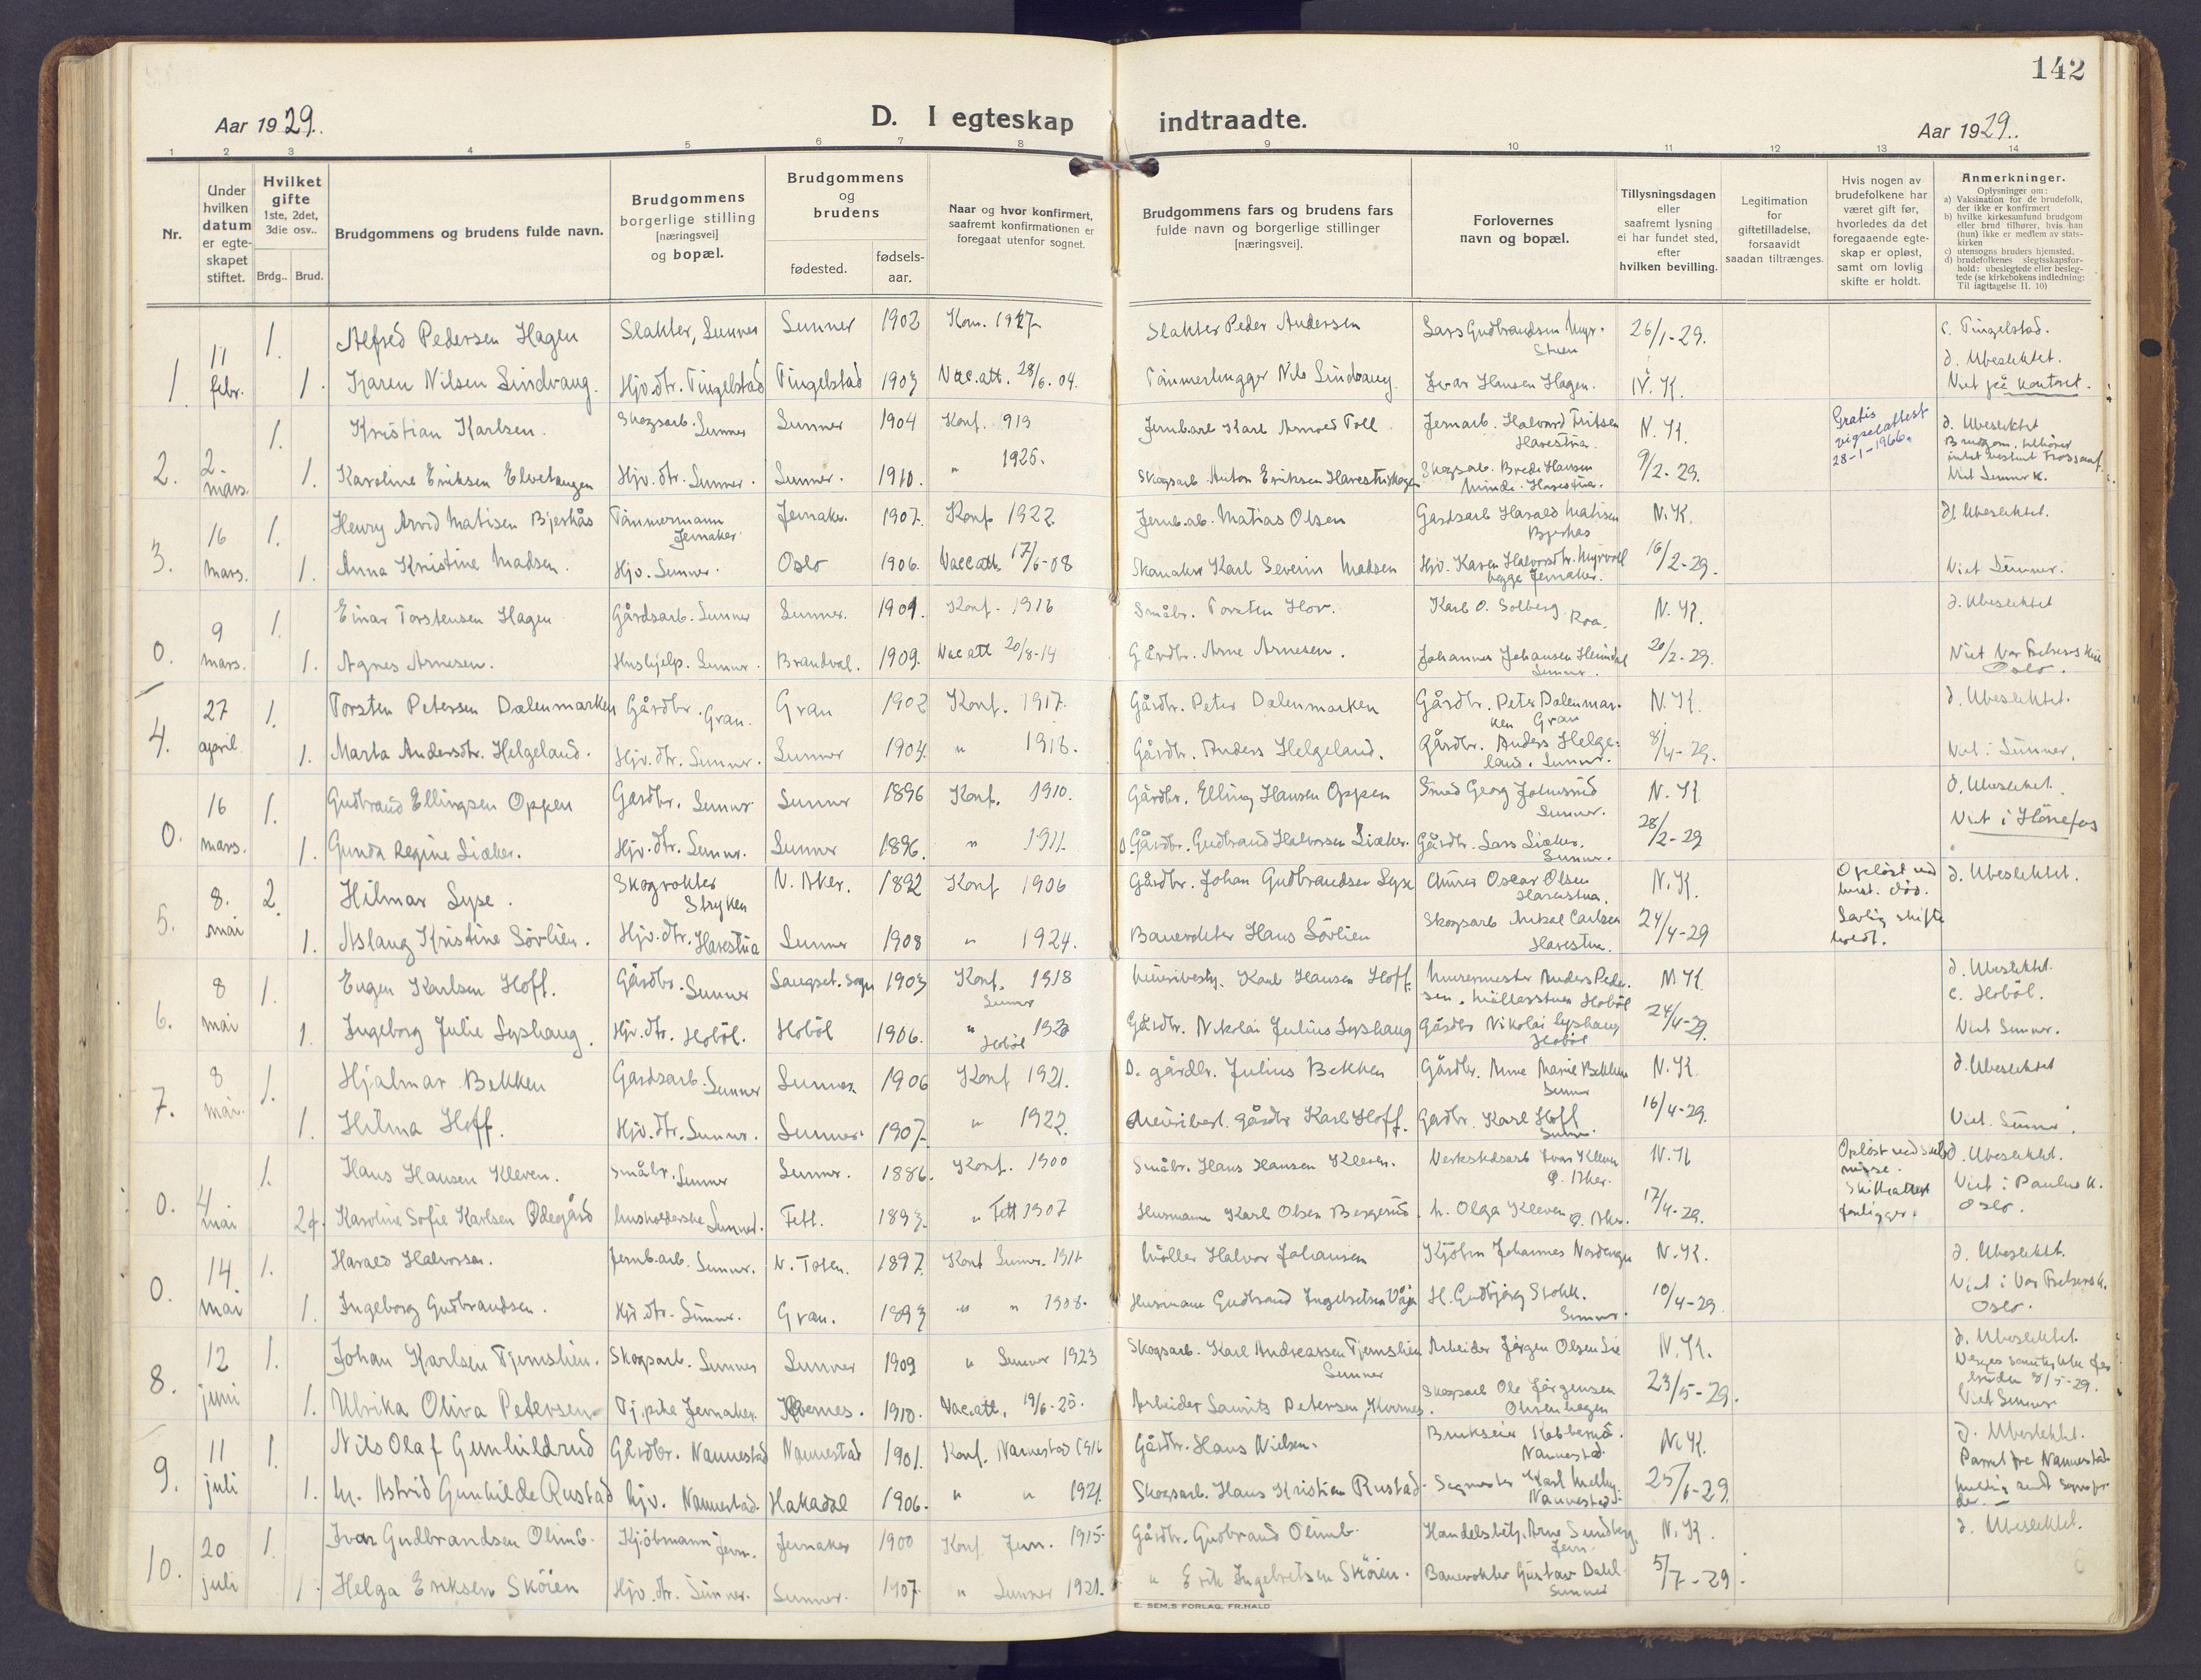 SAH, Lunner prestekontor, H/Ha/Haa/L0002: Ministerialbok nr. 2, 1922-1931, s. 142